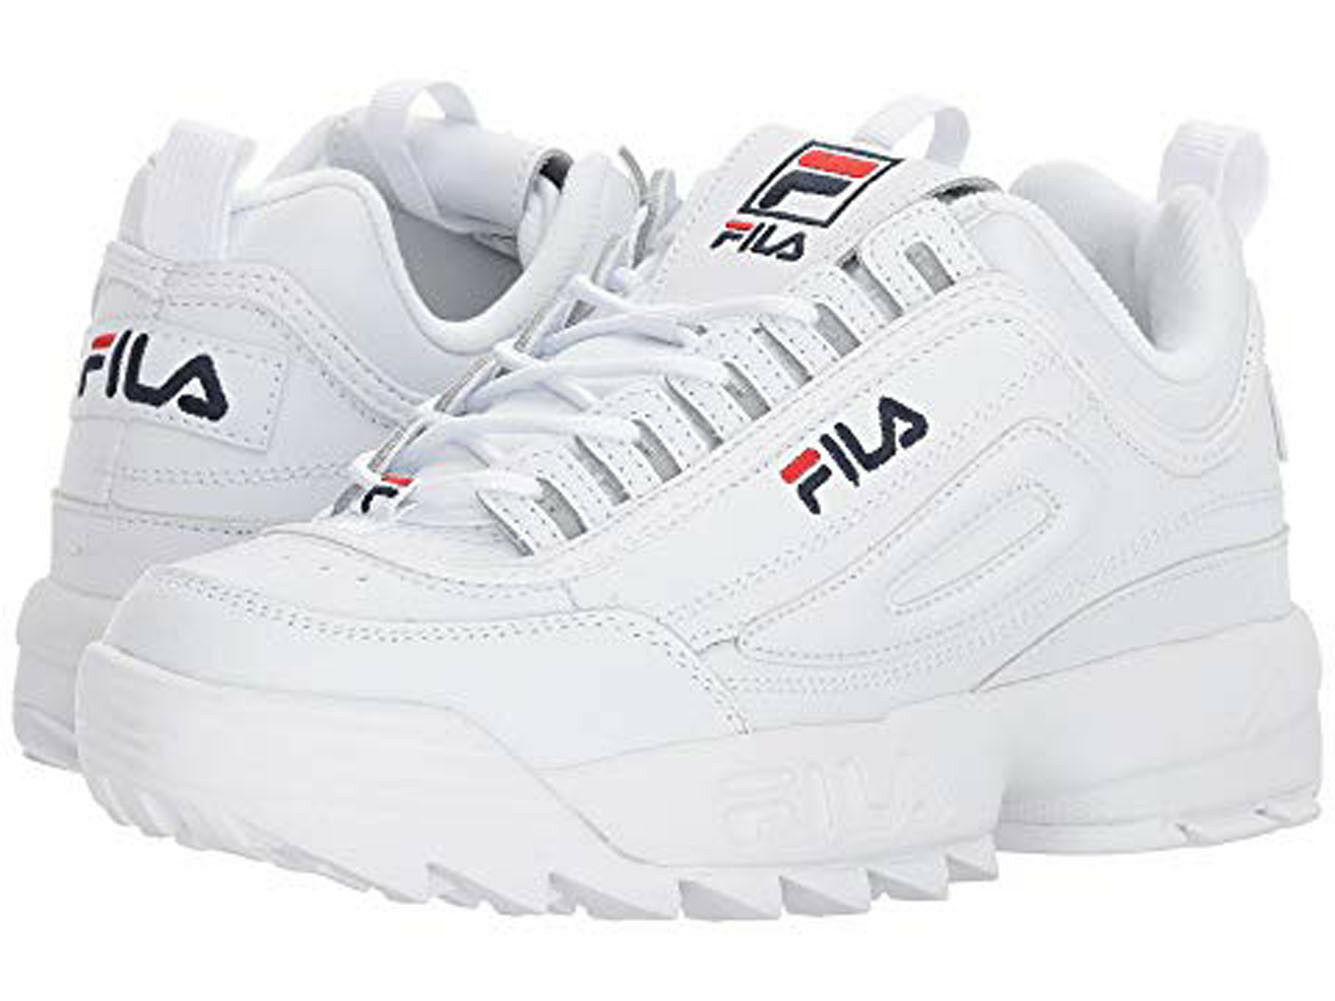 FILA Disruptor II Women's Shoe White Size 8 US